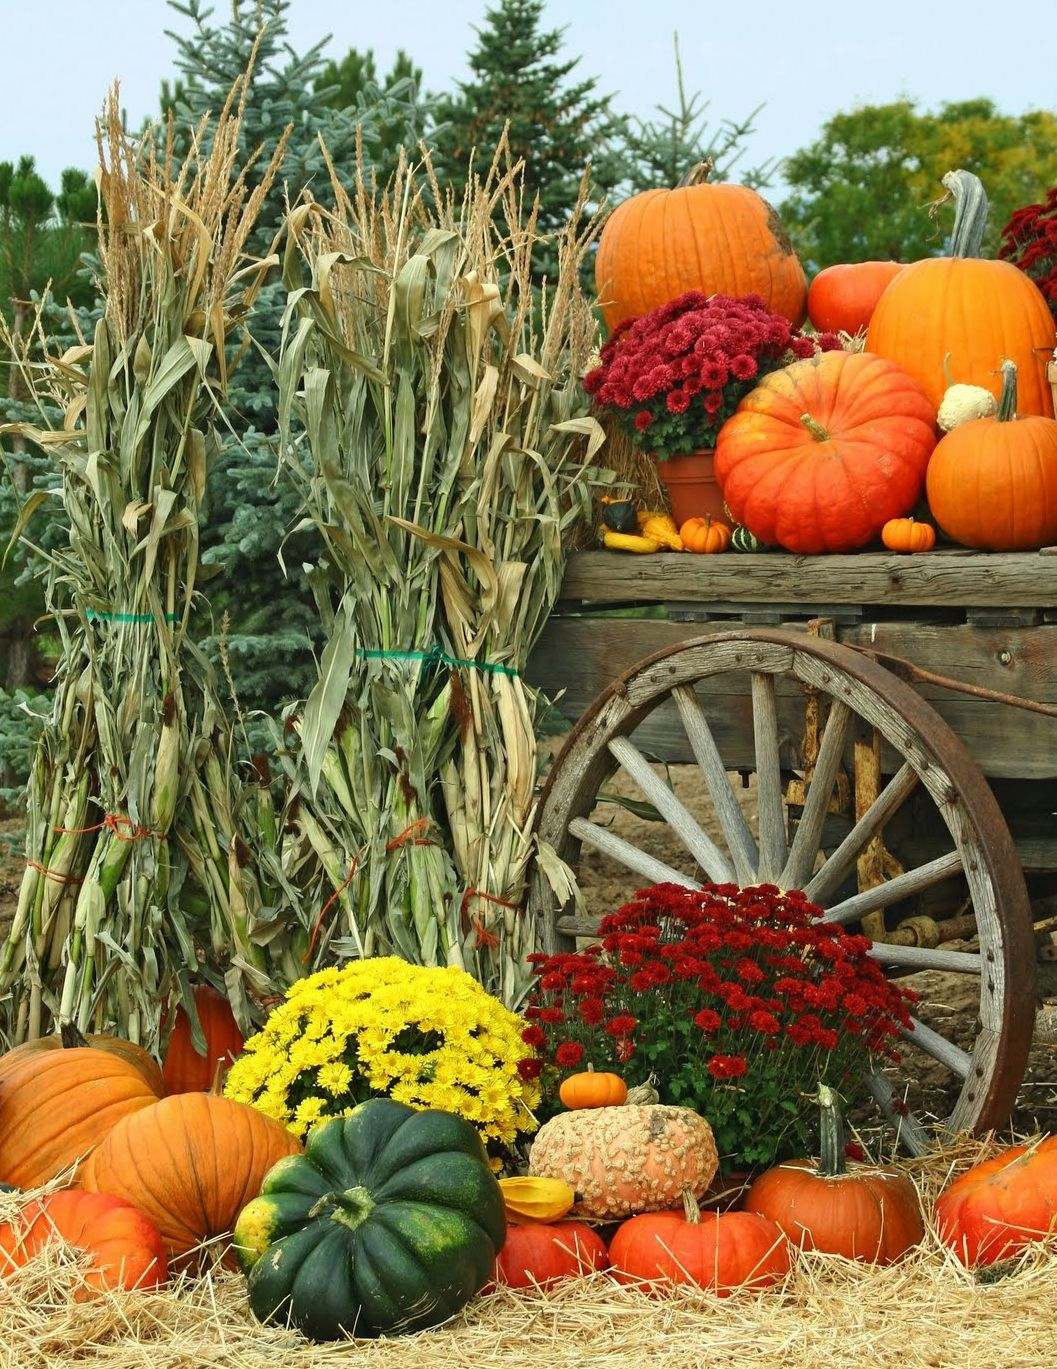 Mums Pumpkins Beautiful Autumn Colors Outdoor Beauty